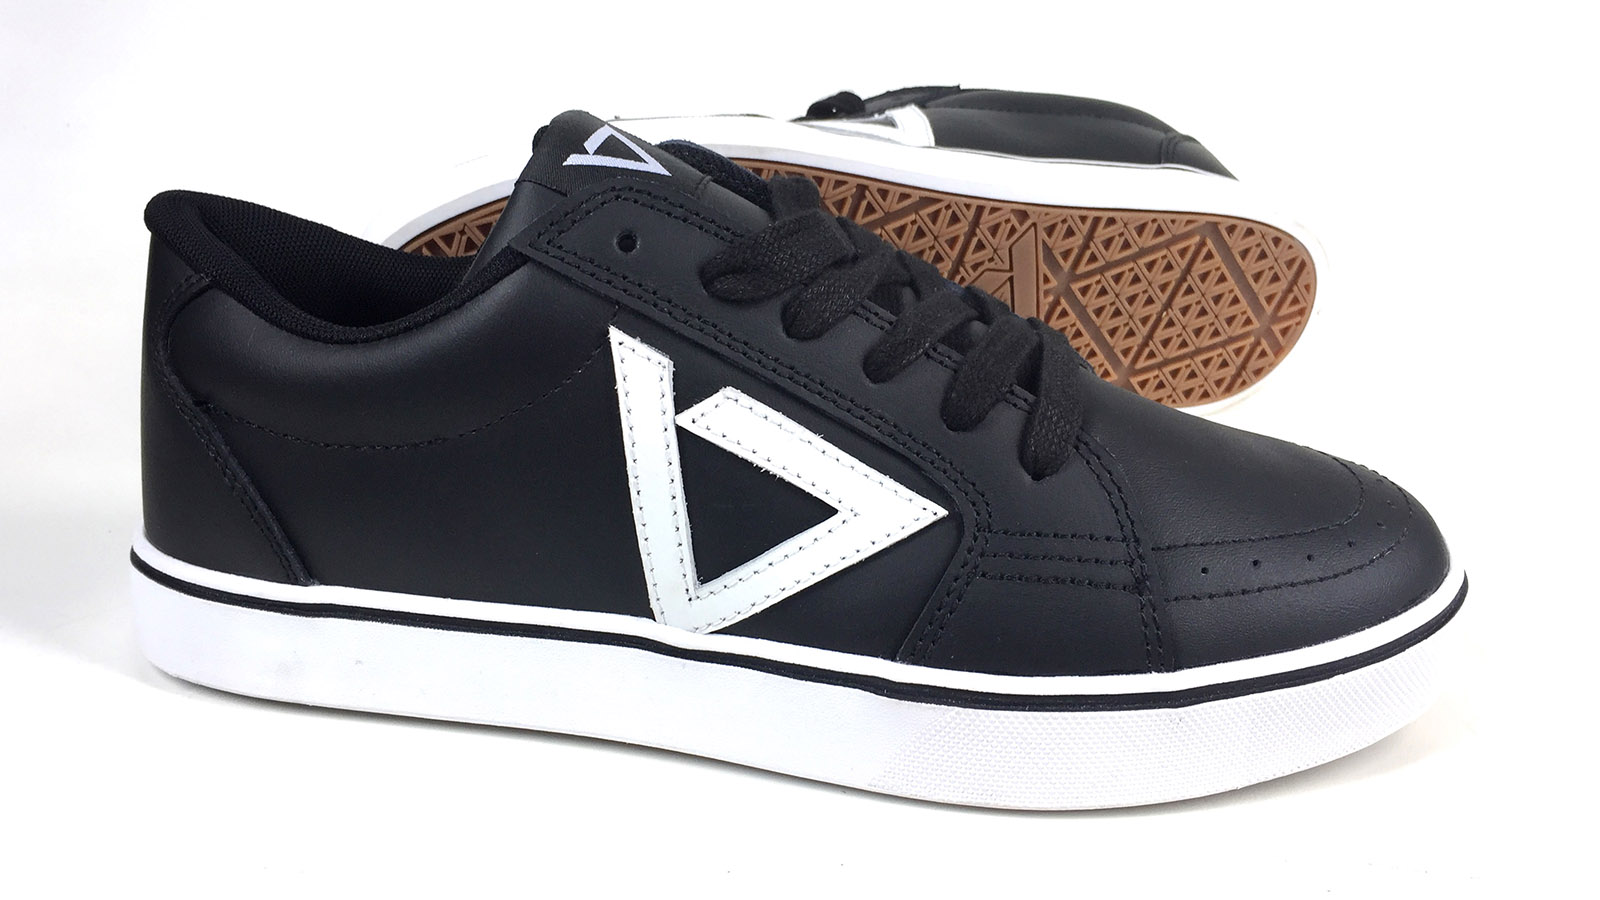 bb077103a4e Ade Skate Footwear FW18 19 Preview - Boardsport SOURCE